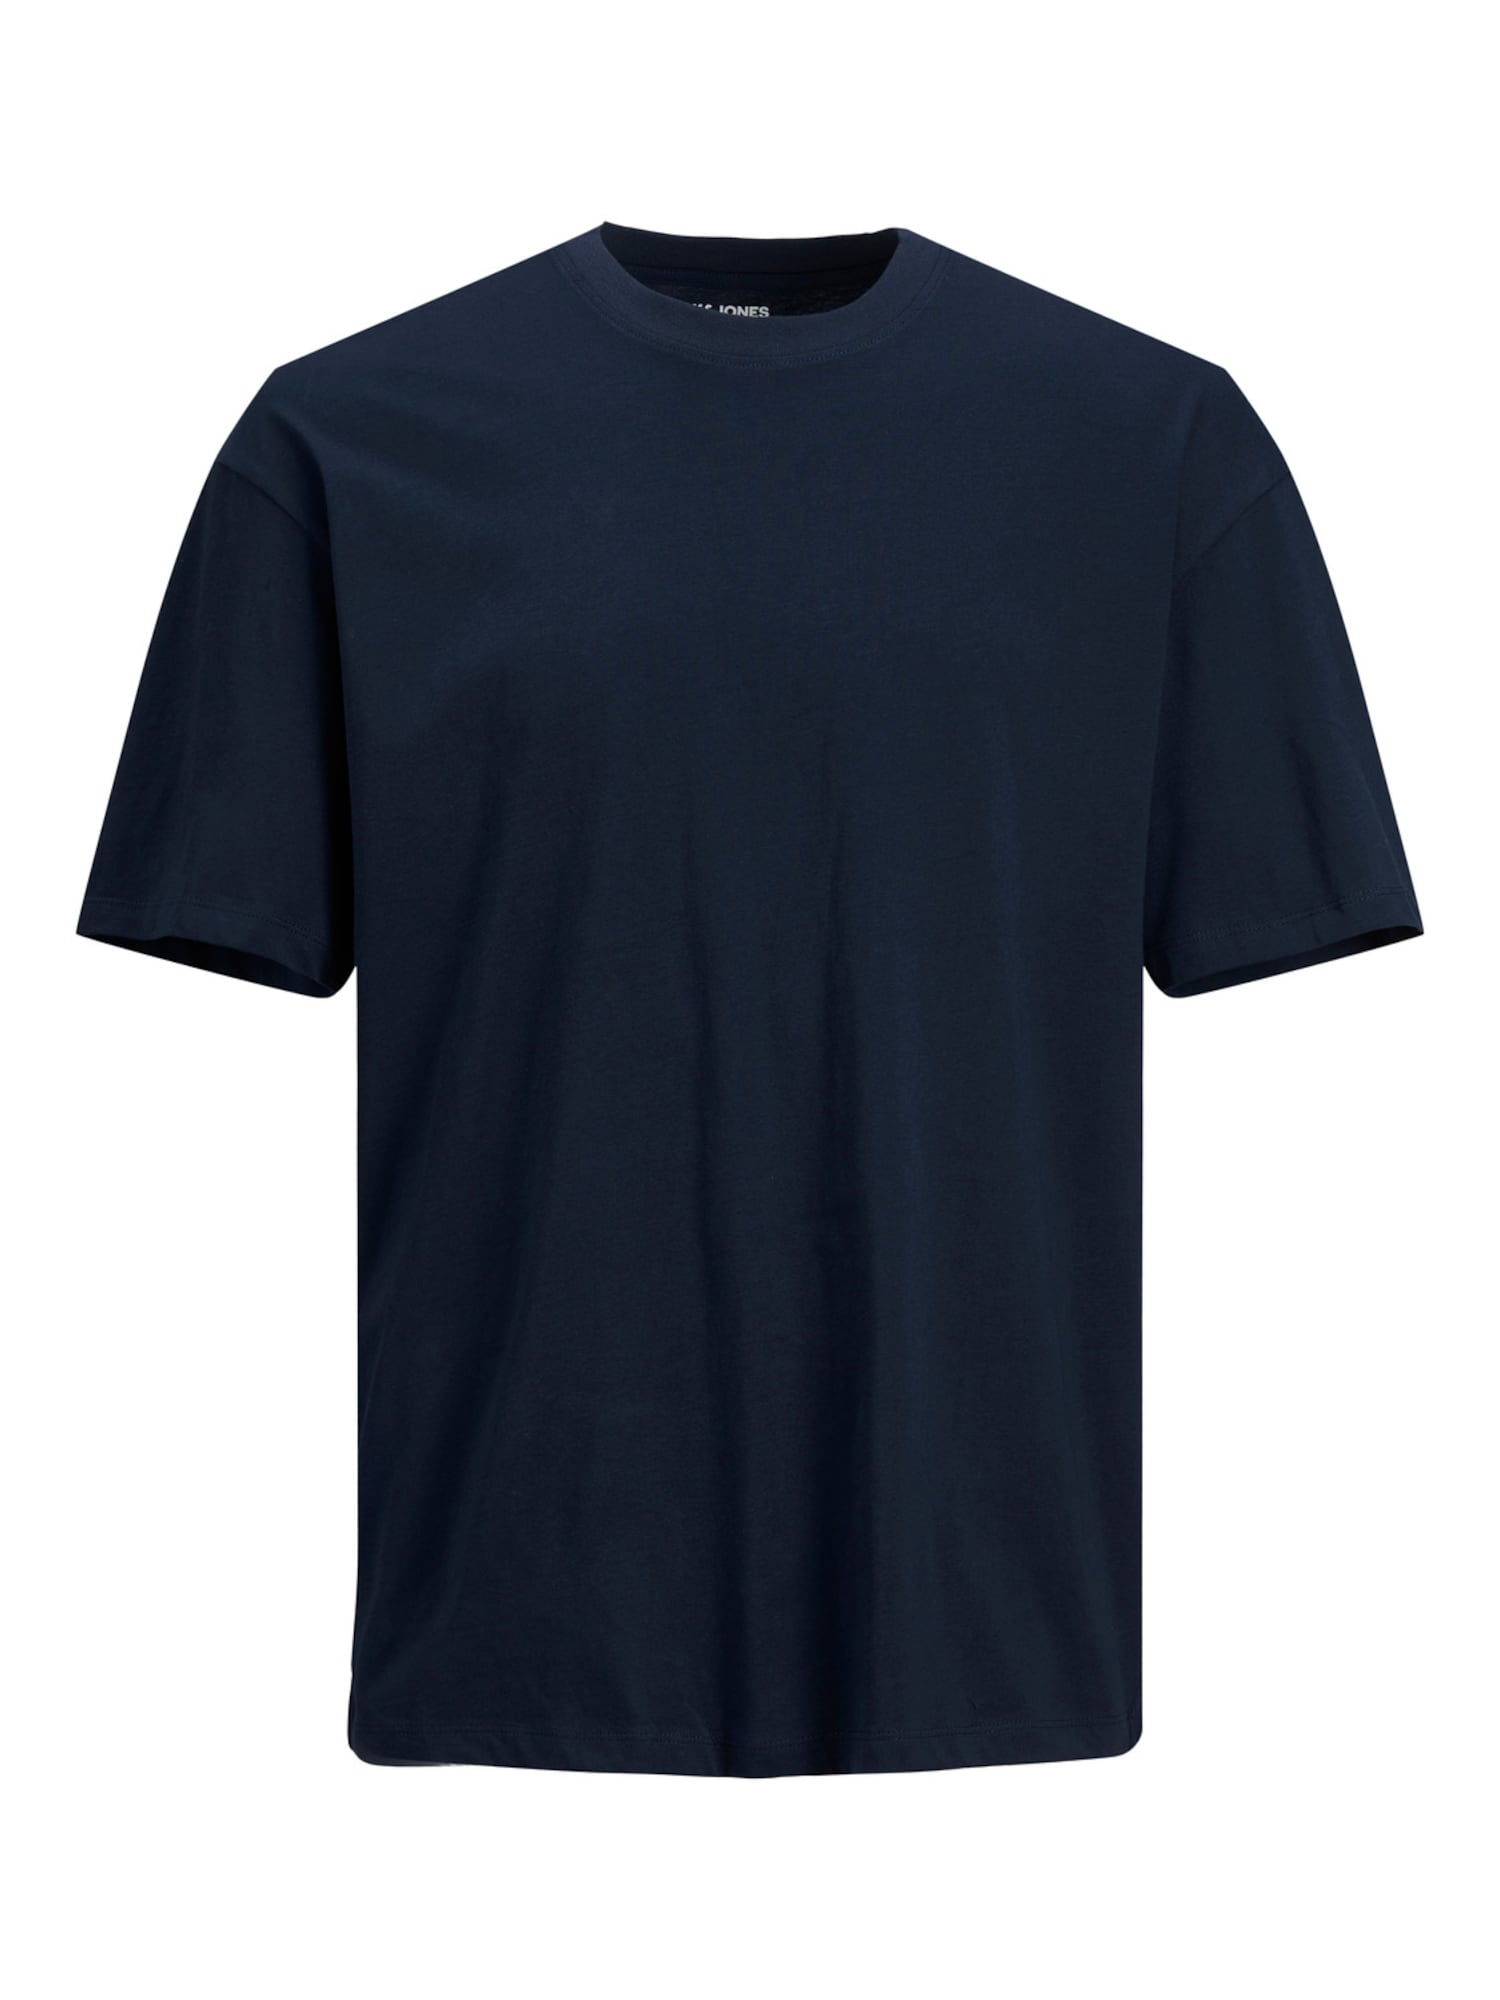 JACK & JONES Tričko 'Brink'  tmavě modrá